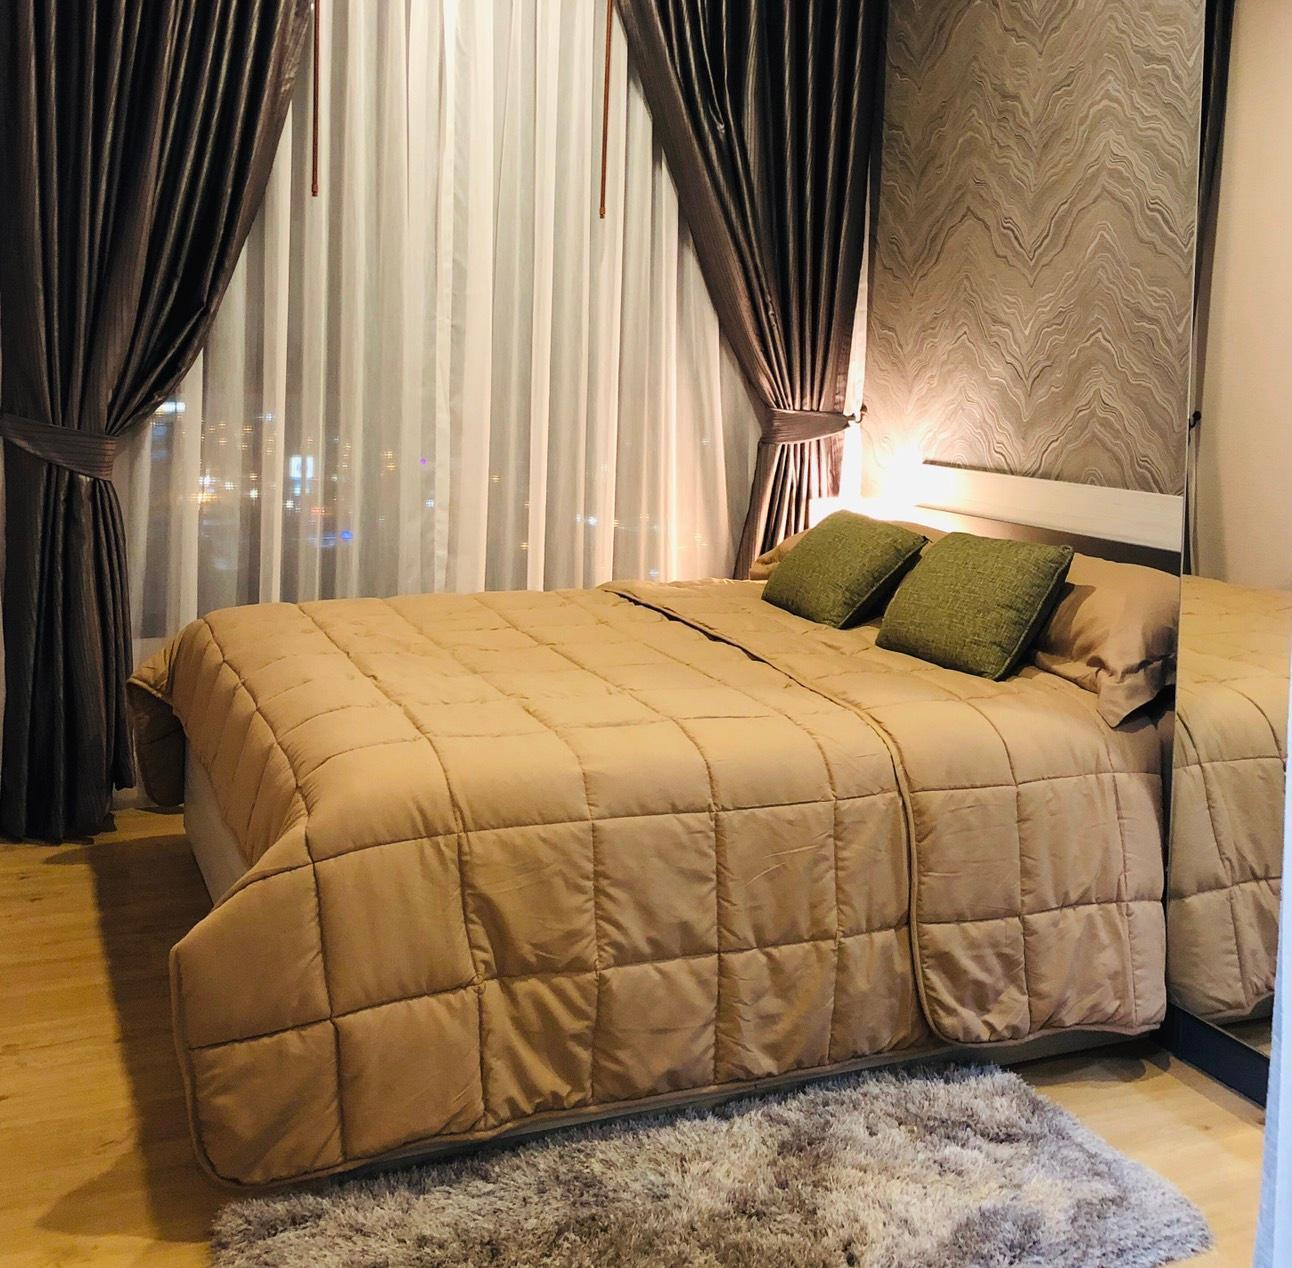 Orchid @ Laemchabang- Sriracha Chonburi อพาร์ตเมนต์ 1 ห้องนอน 1 ห้องน้ำส่วนตัว ขนาด 27 ตร.ม. – ศรีราชา